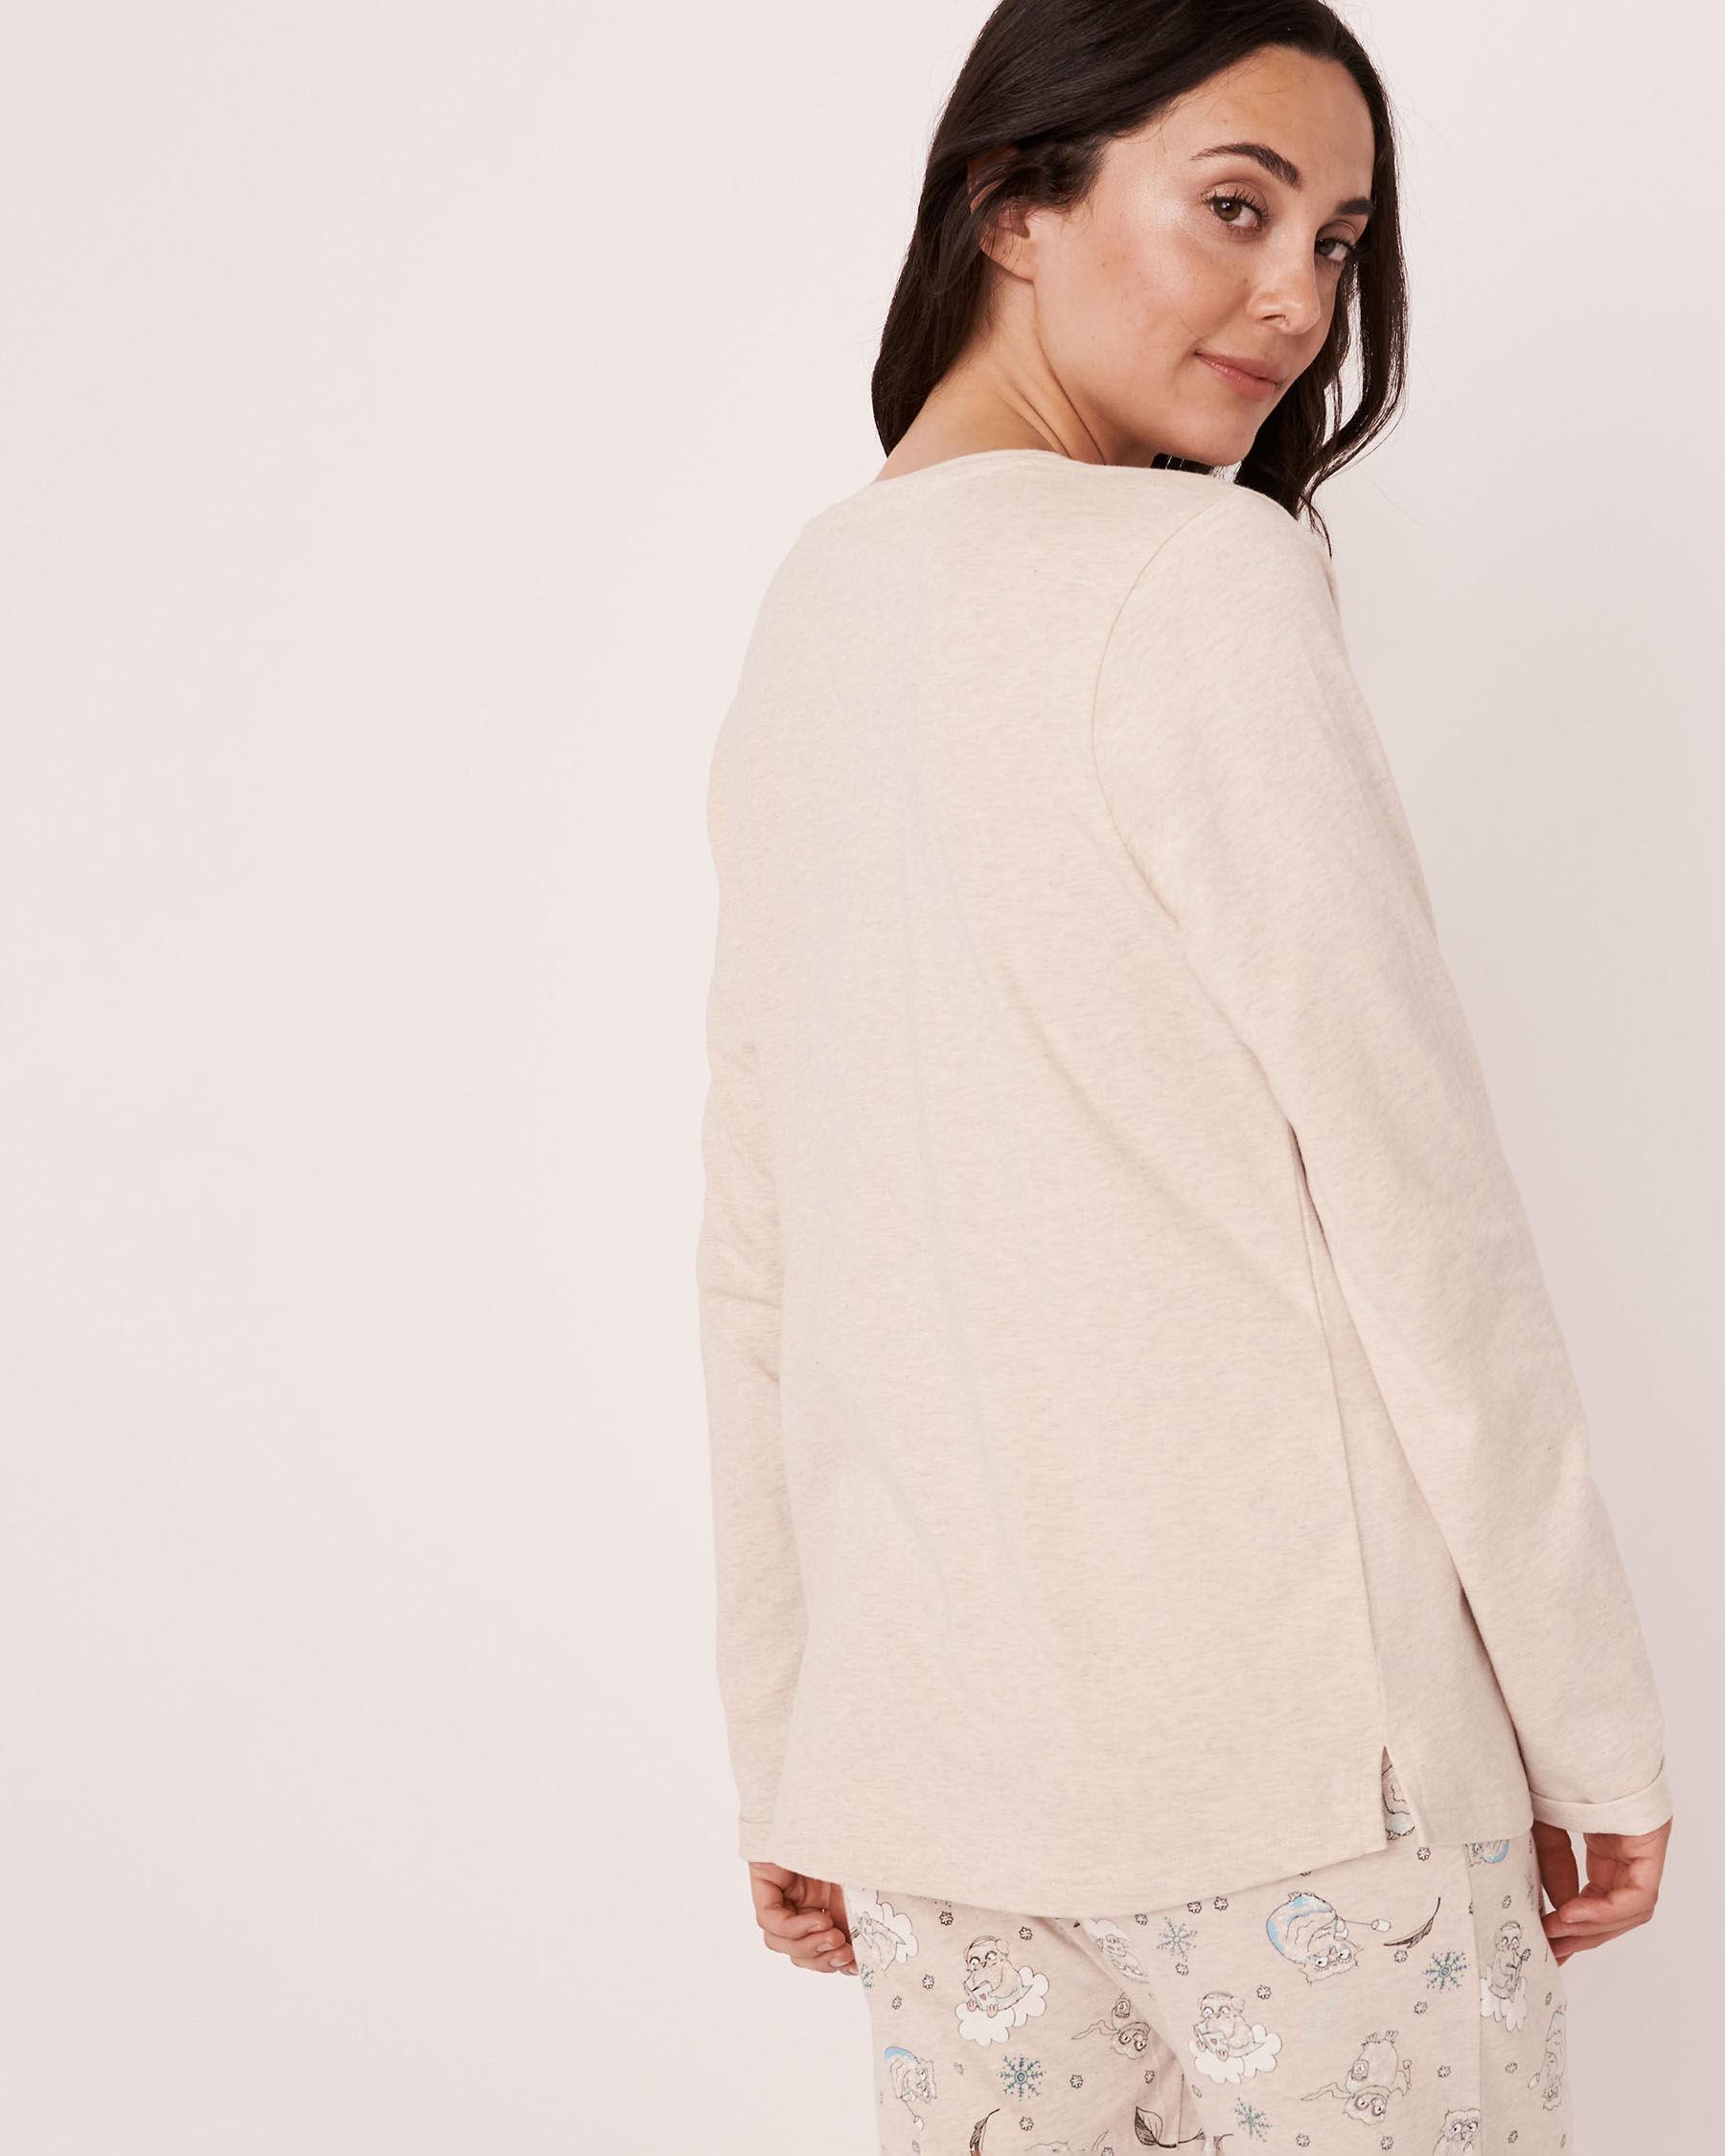 LA VIE EN ROSE Organic Cotton Long Sleeve Shirt Oatmeal 40100154 - View3